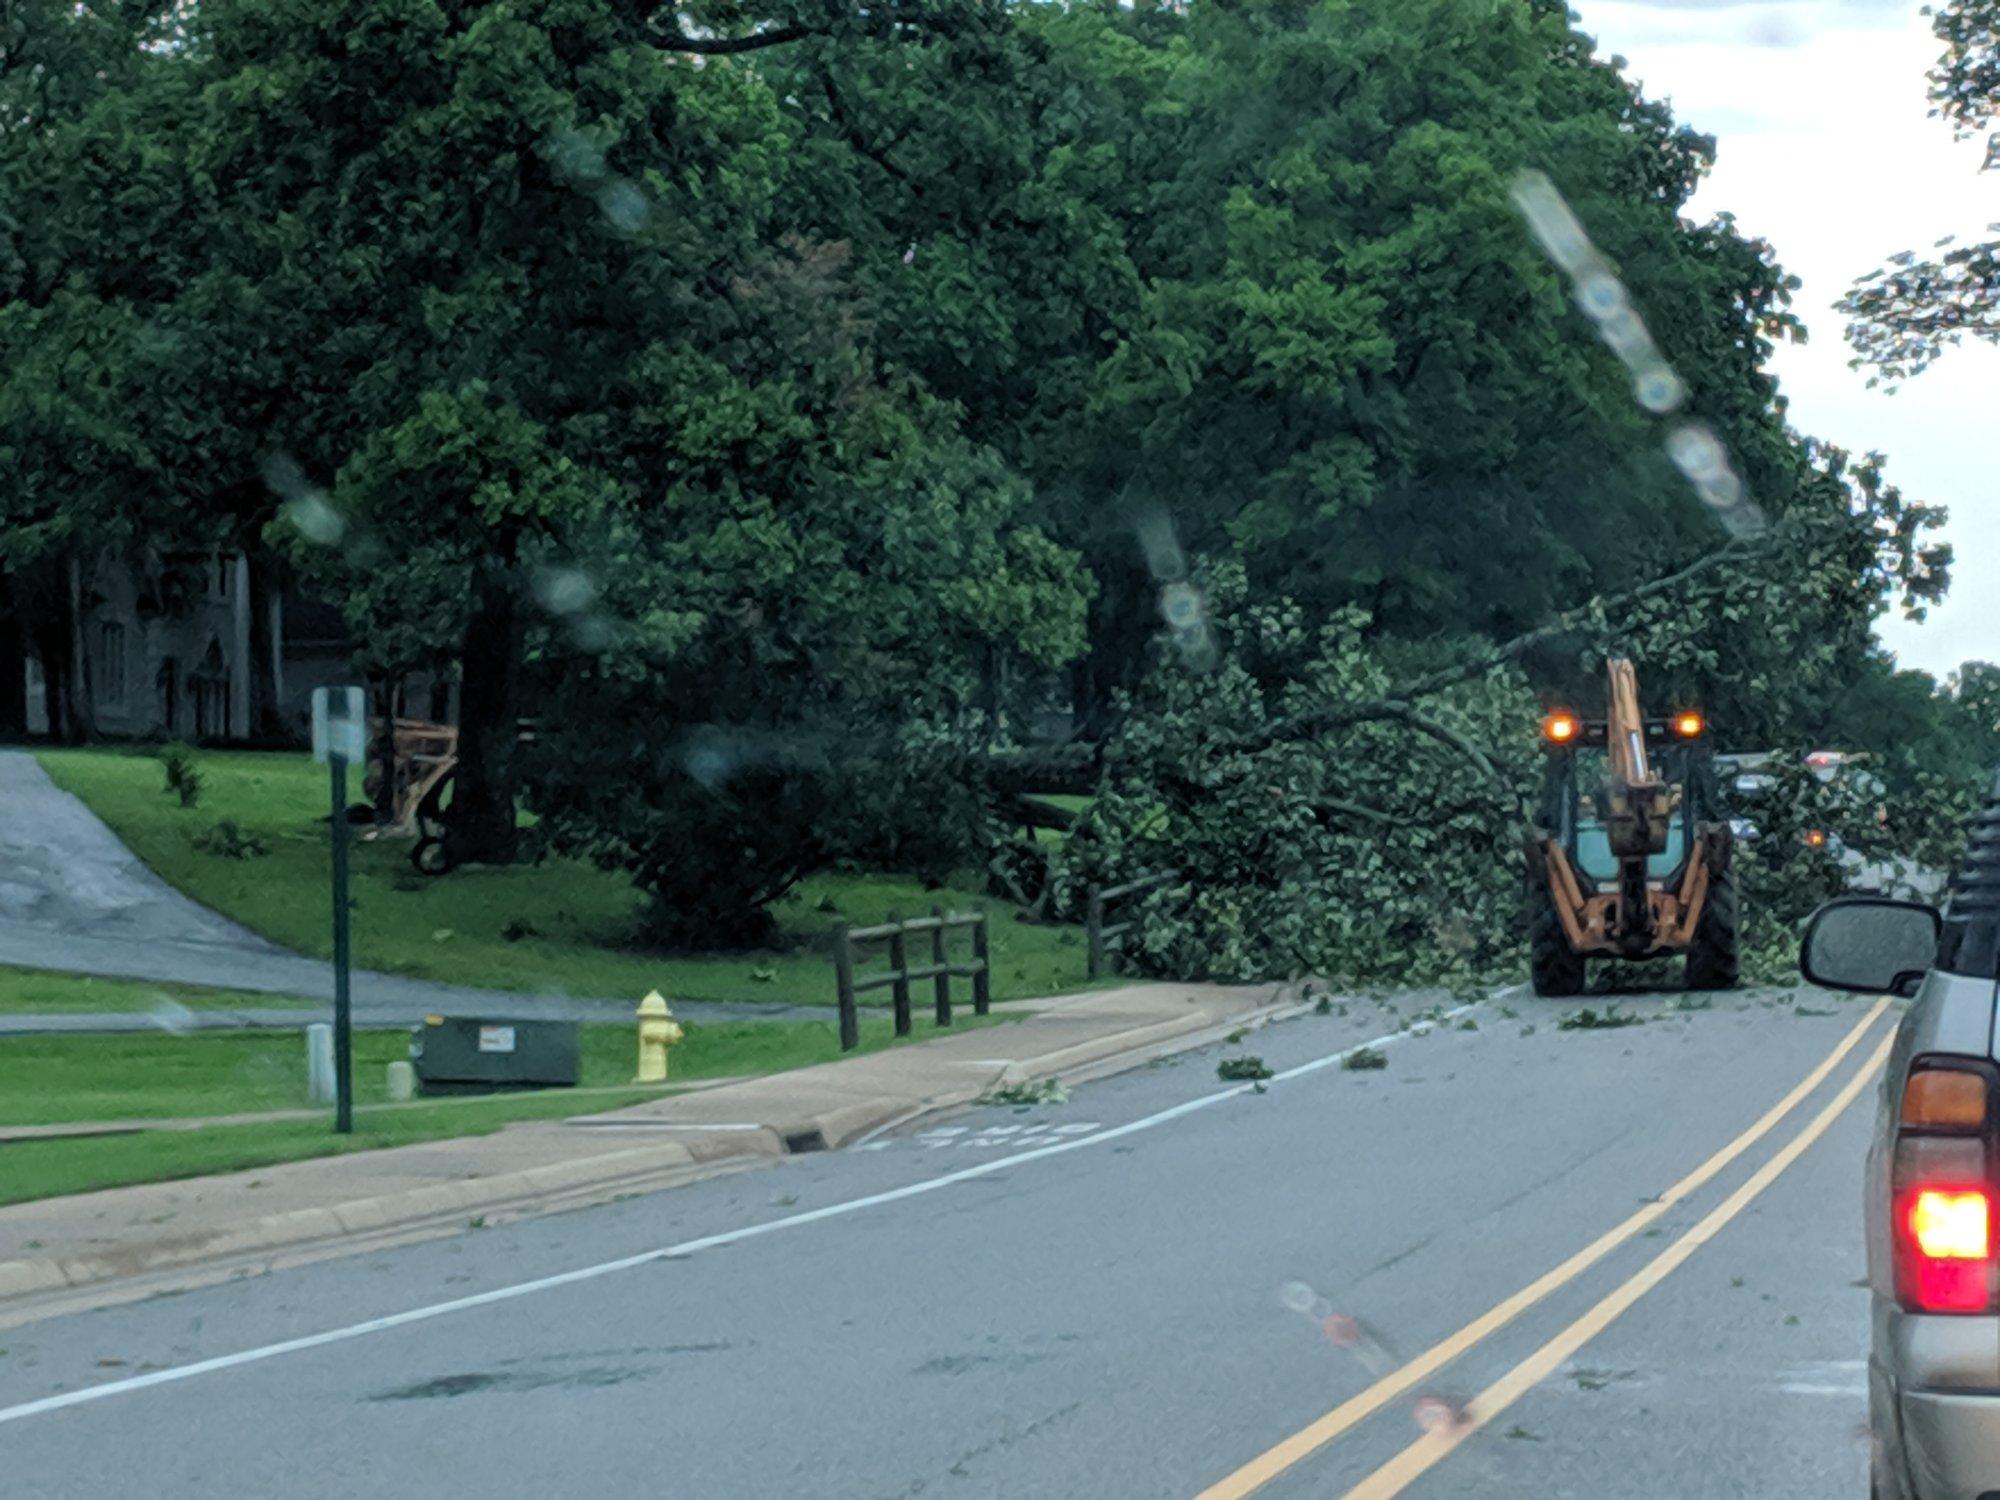 Tree damage on N. Dogwood St, near Cheri Whitlock Pkwy, Siloam Springs (Courtesy of Brian Smith)